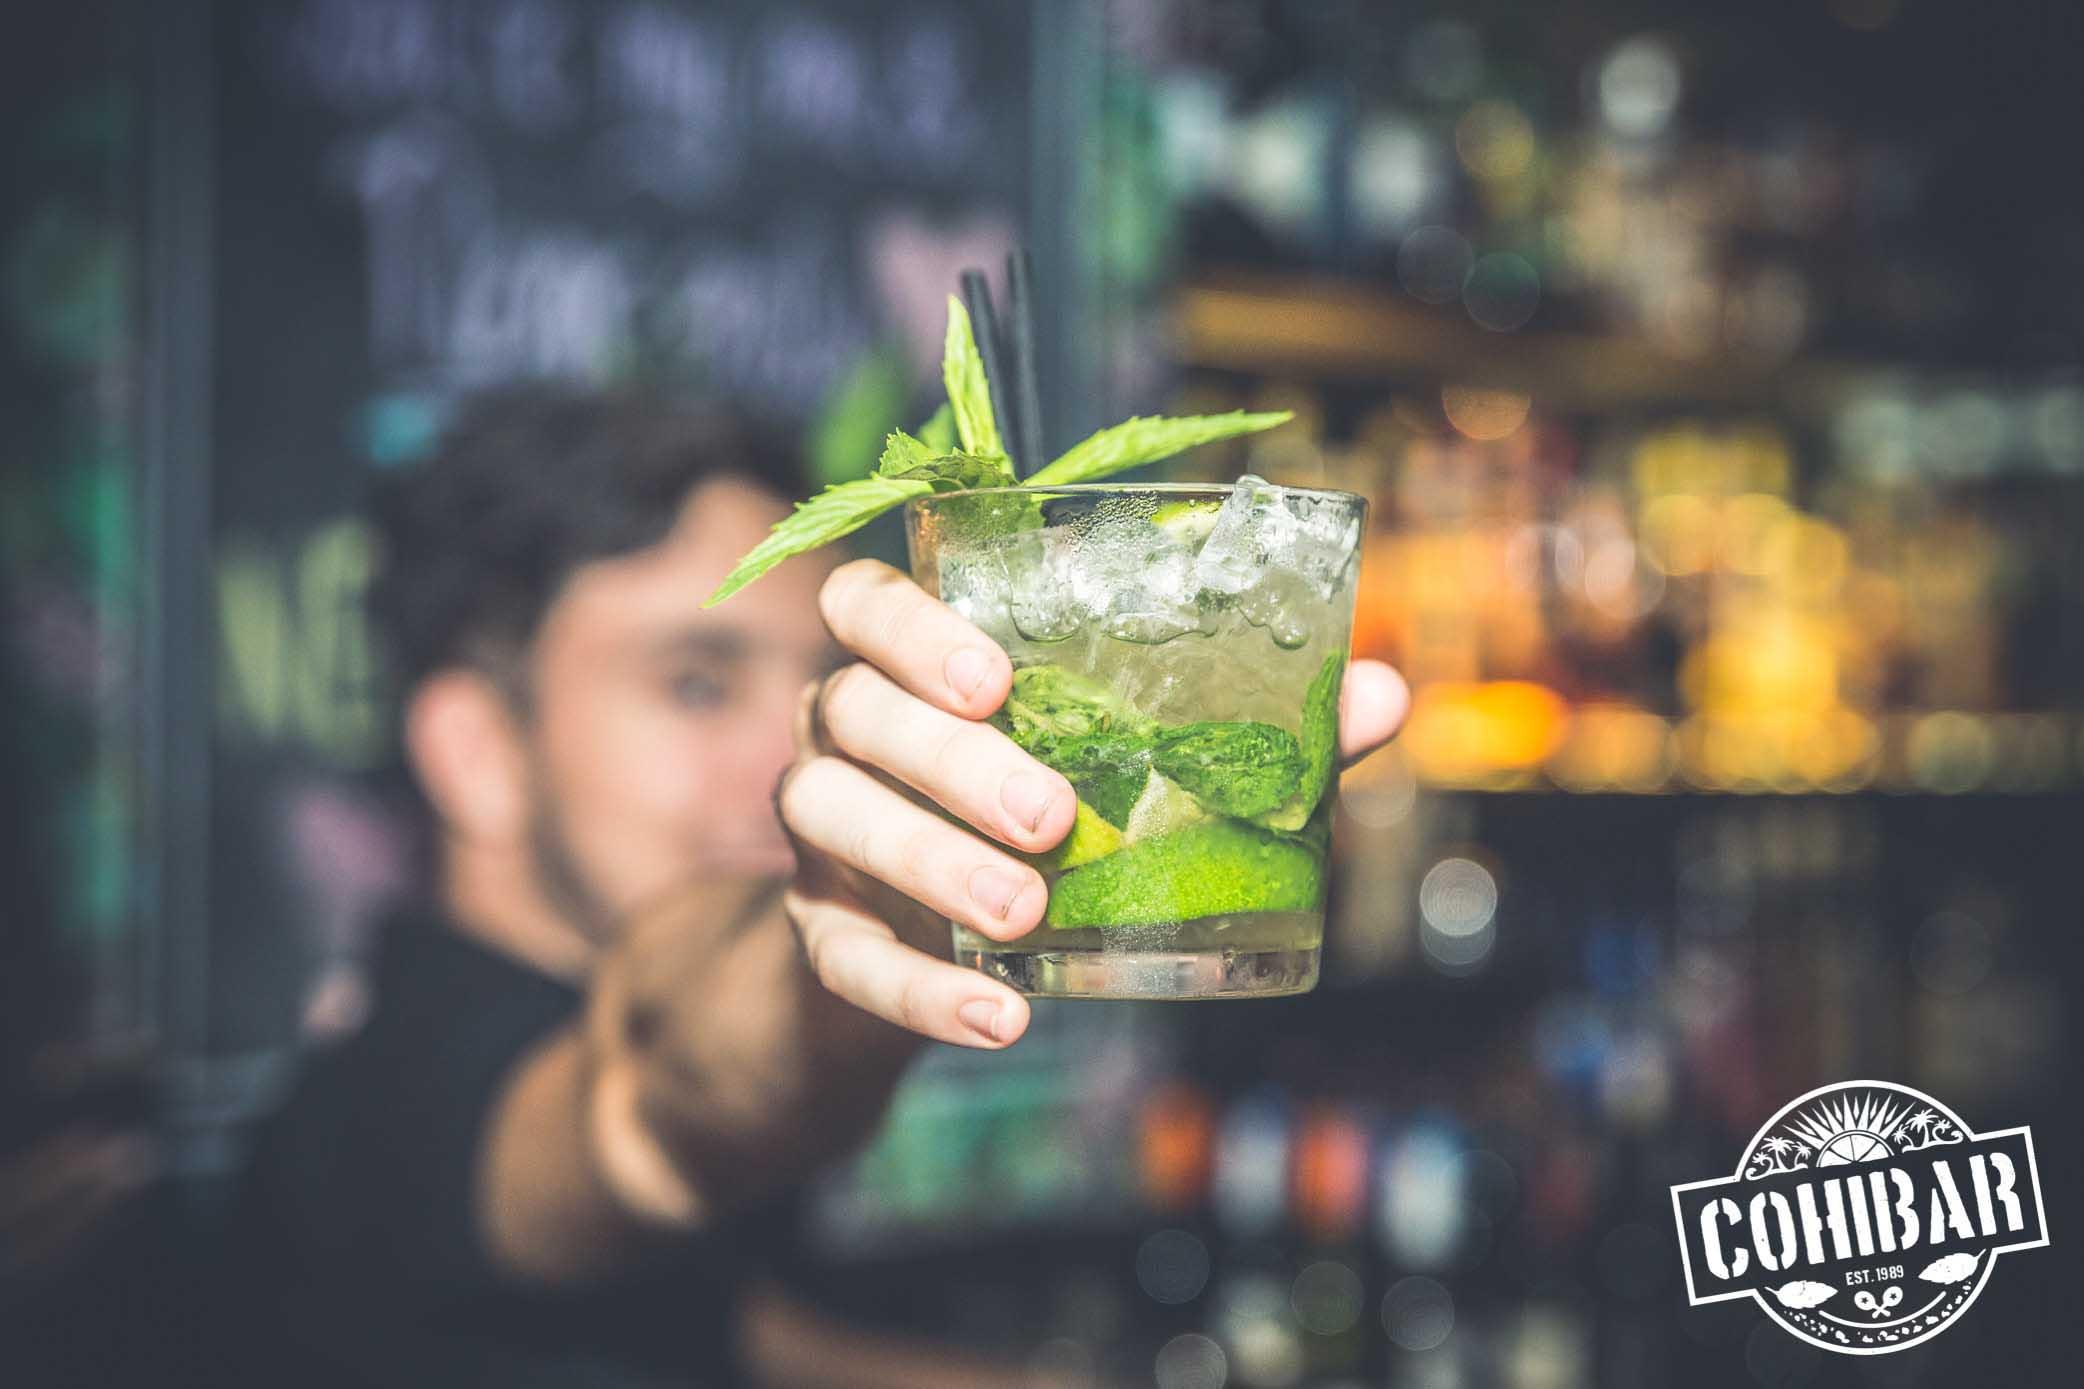 Cohibar – CBD Rooftop Bars